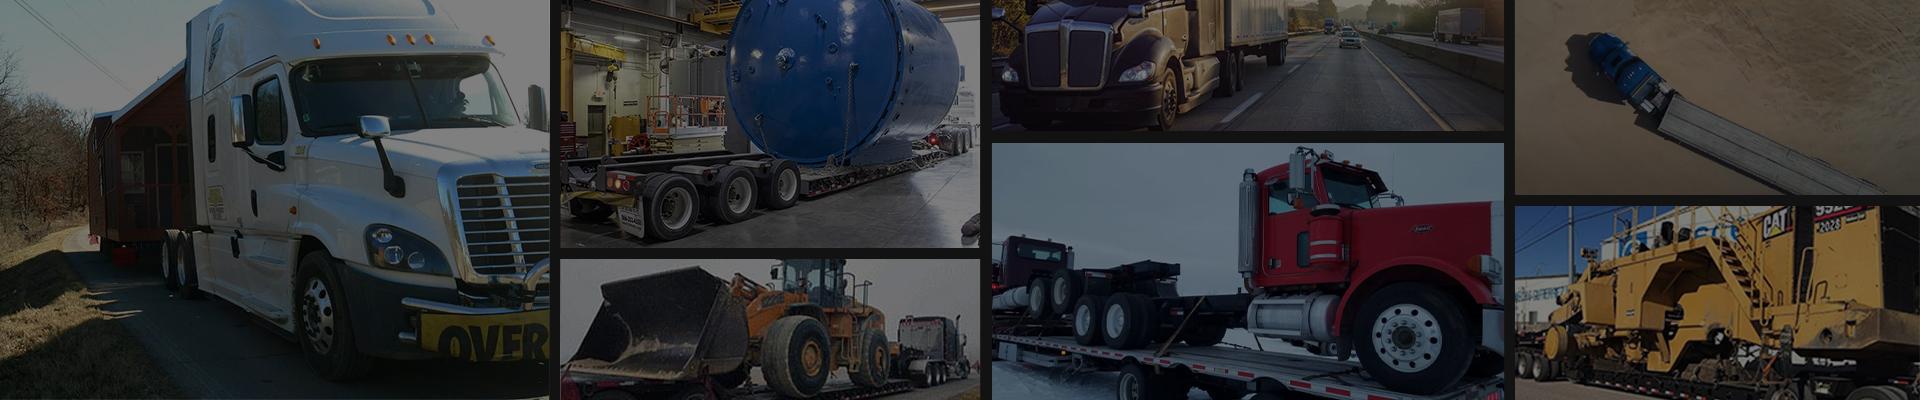 Darkened background of transport photos combined